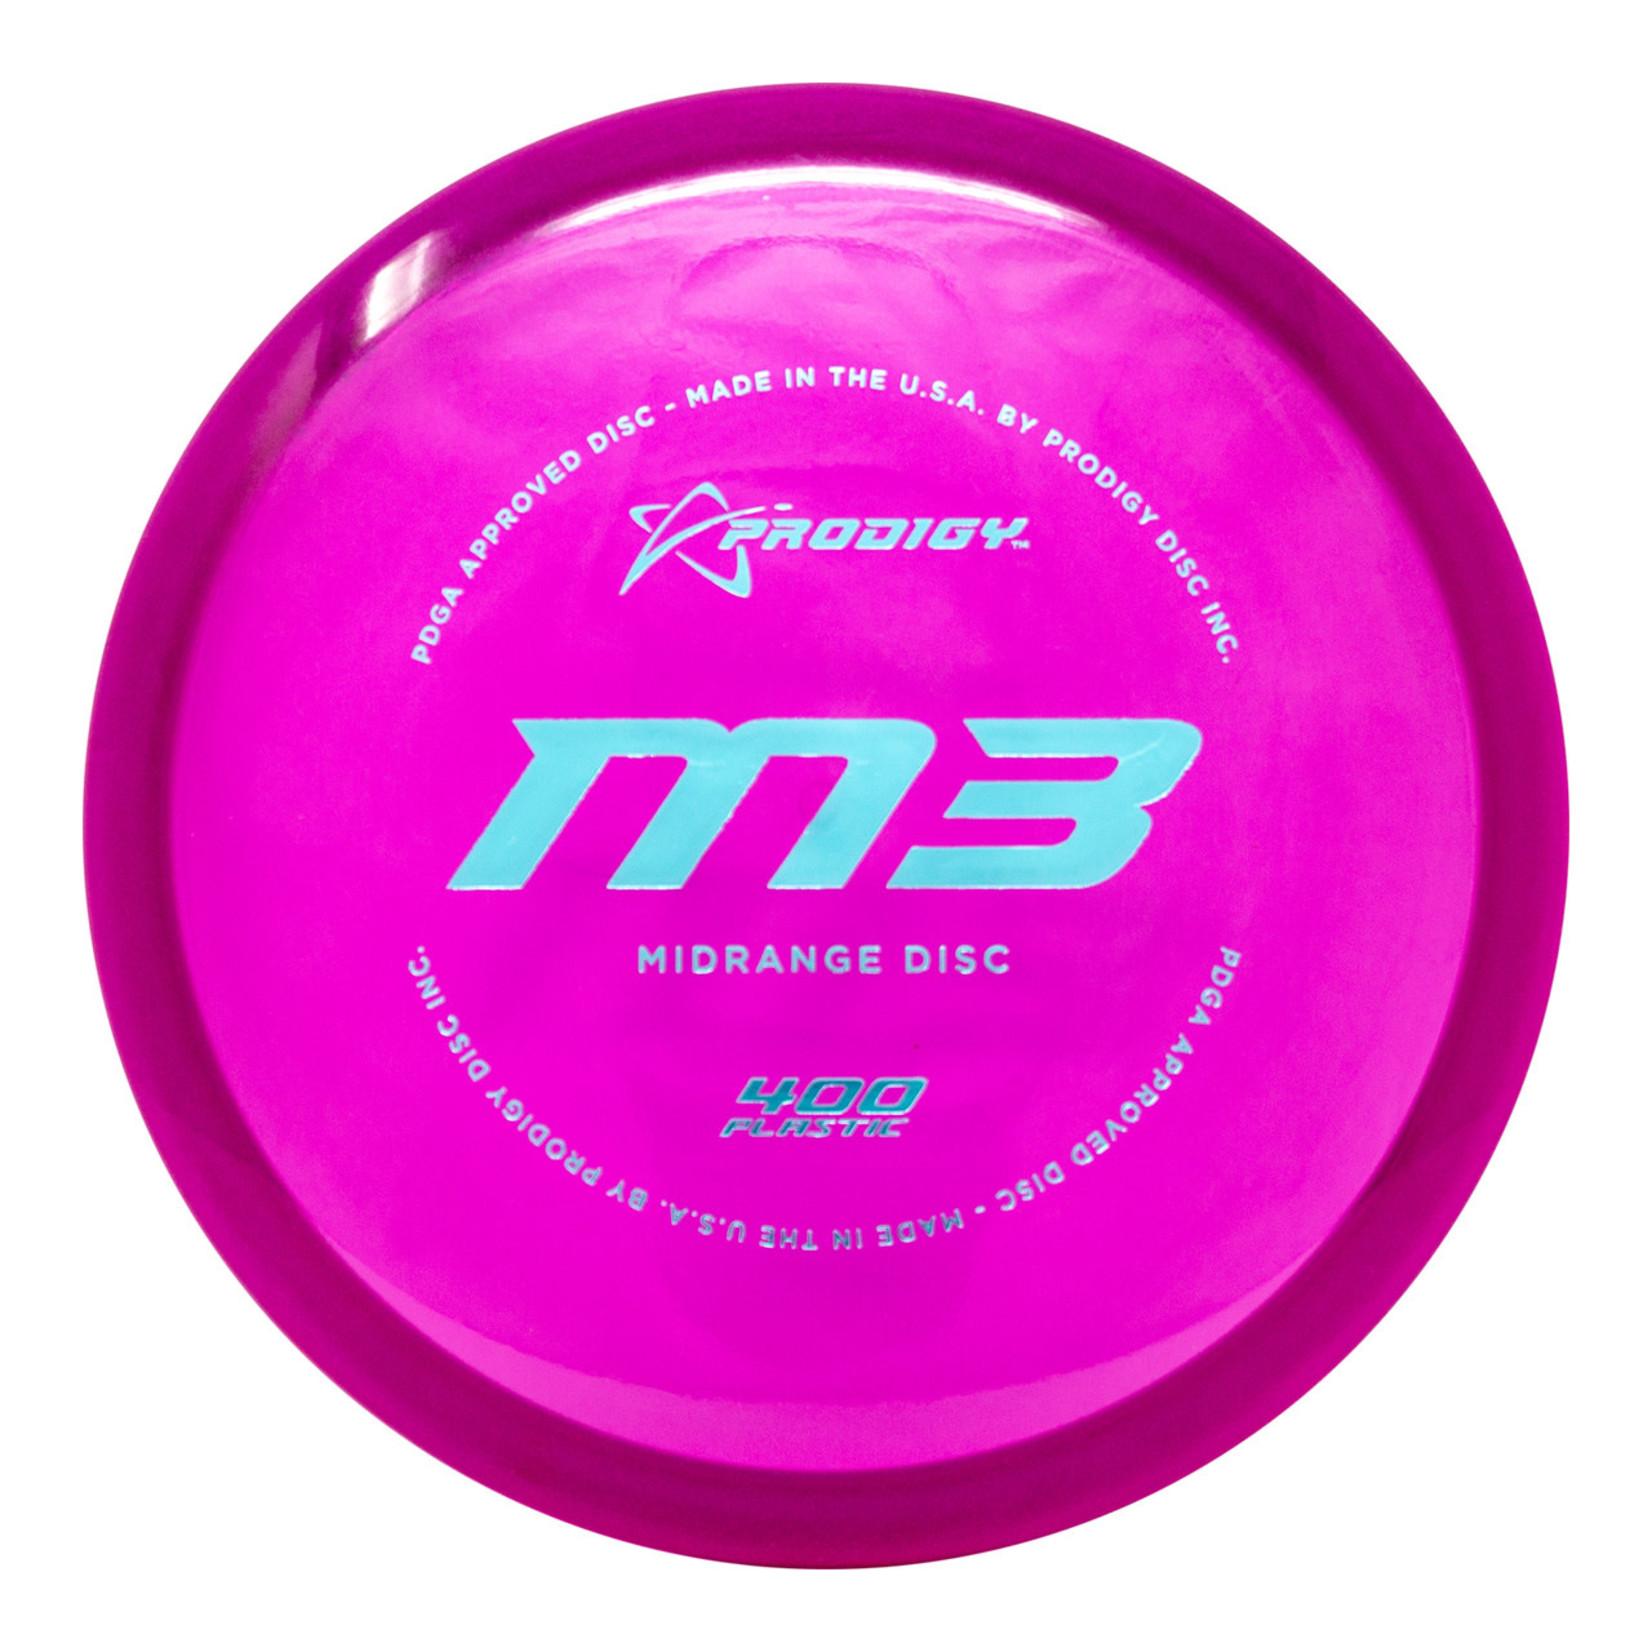 Prodigy Prodigy Disc, M3 Midrange Driver, M3-4-180